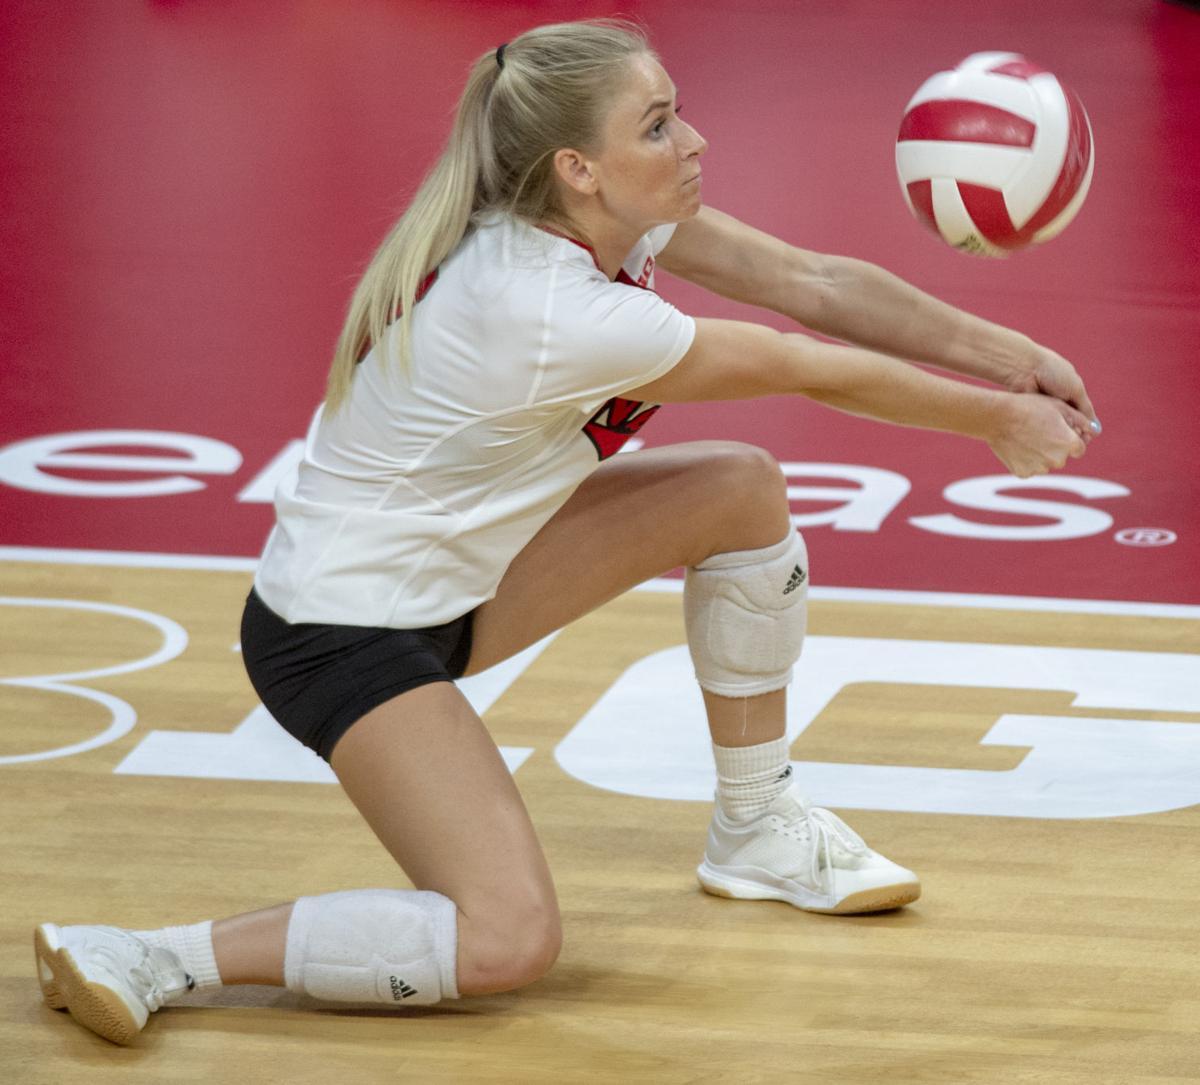 Nebraska Volleyball Transfer Megan Miller Will Stay In The Big Ten Conference Huskers Columbustelegram Com